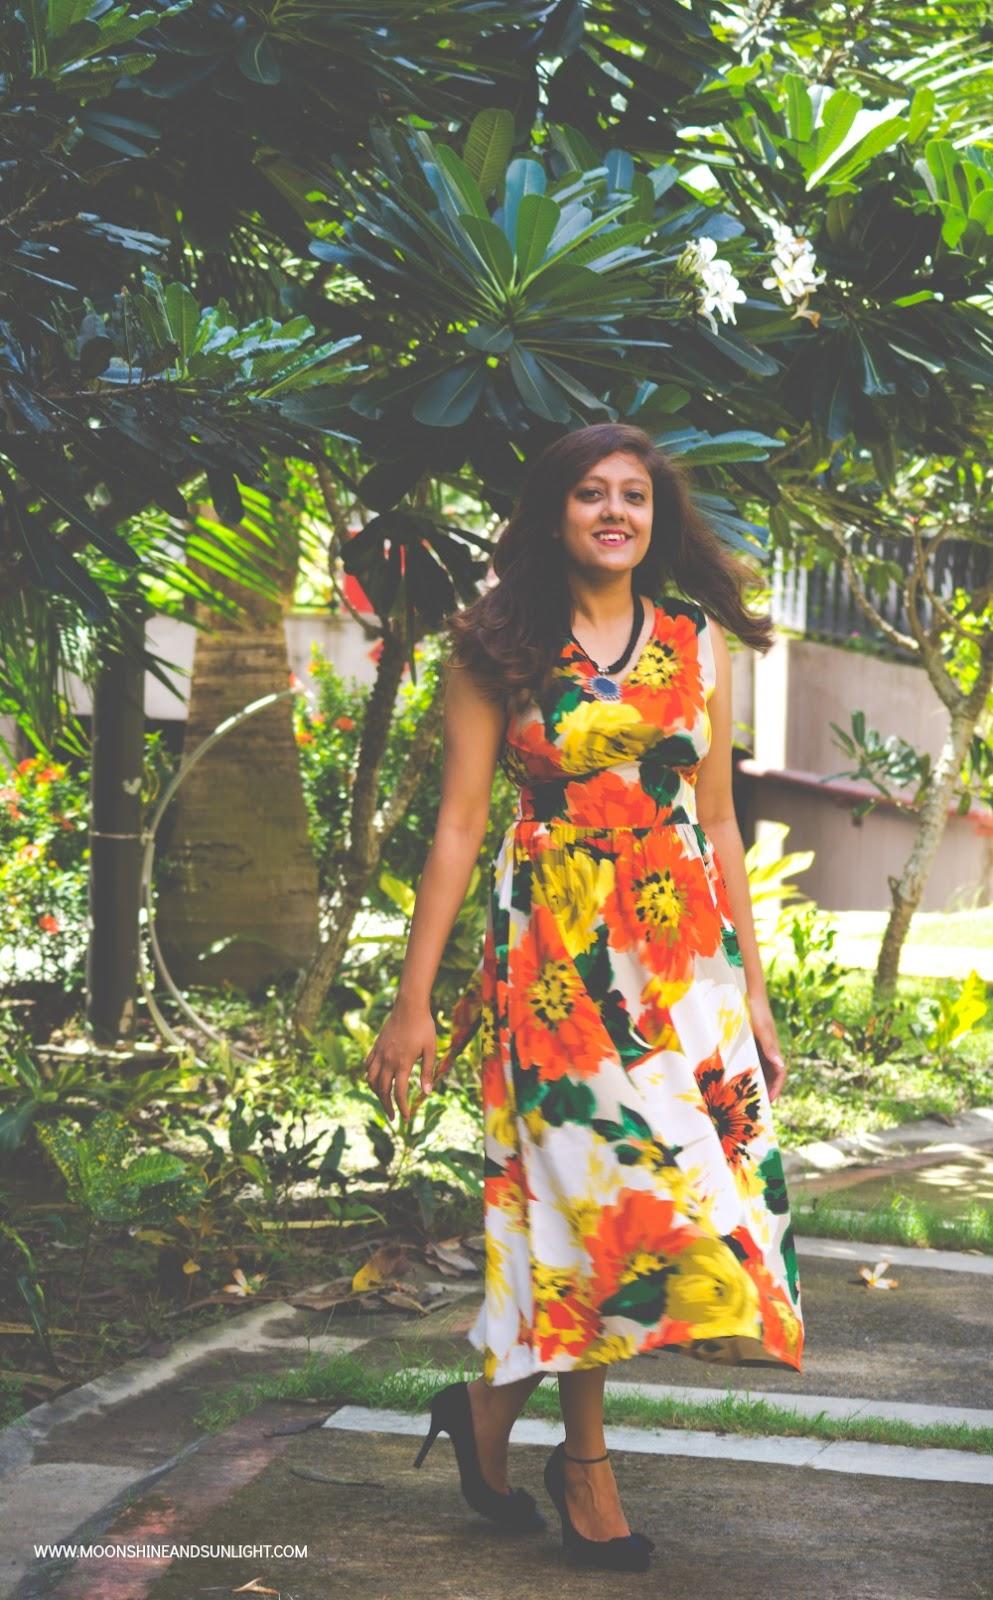 Gravitating, OOTD Post, Fashion blog by Priyanjana Roy, Moonshine and sunlight, ridress, Bangalore